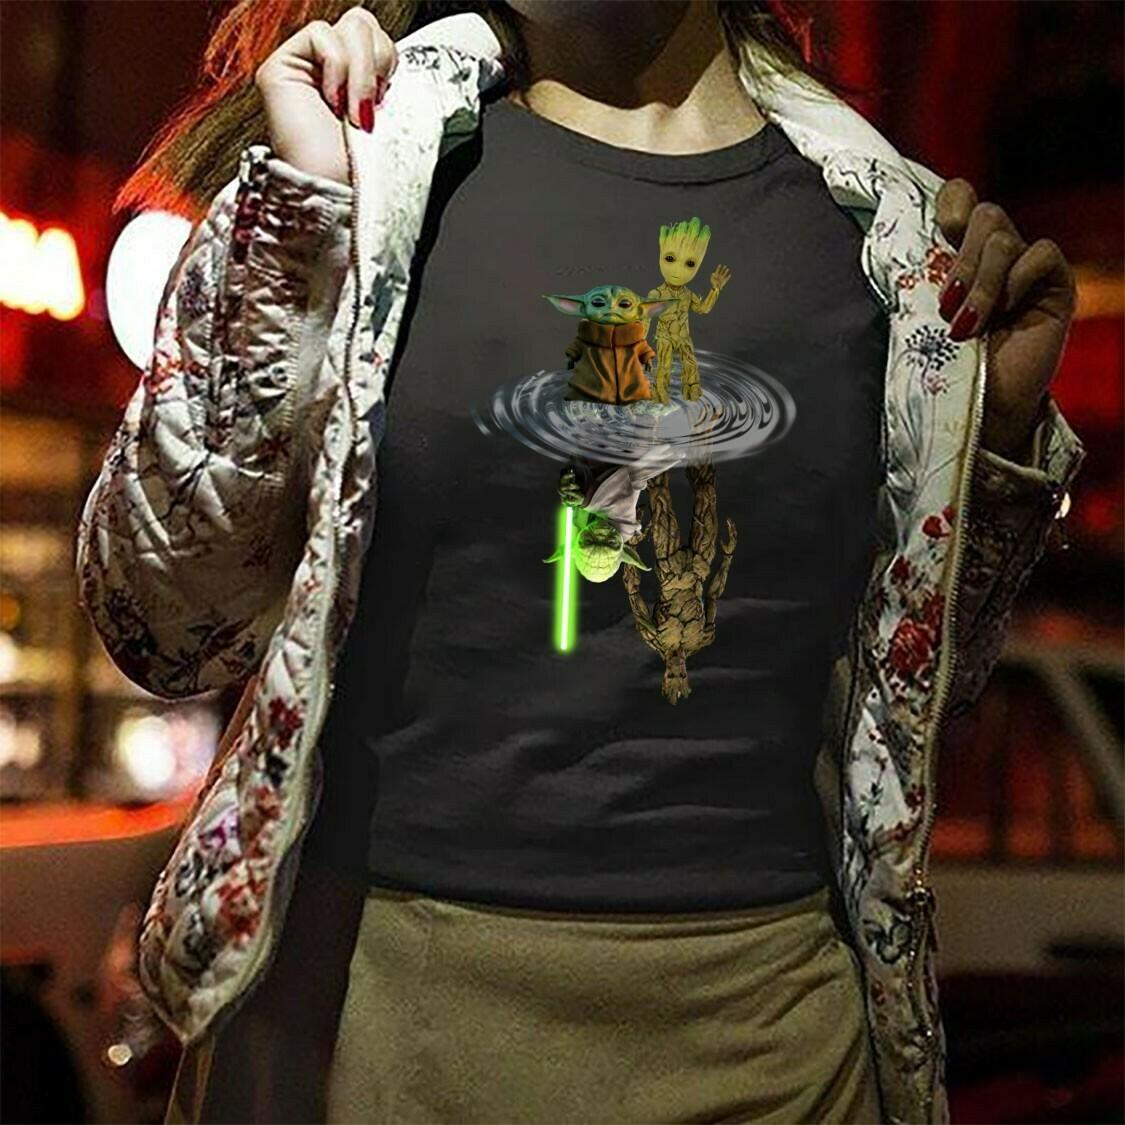 Baby Yoda Groot and Master Yoda Groot Water Reflection The Mandalorian Star Wars Kawaii King Boba Fett Lion King Pride Rock T-Shirt Long Sleeve Sweatshirt Hoodie Jolly Family Gifts